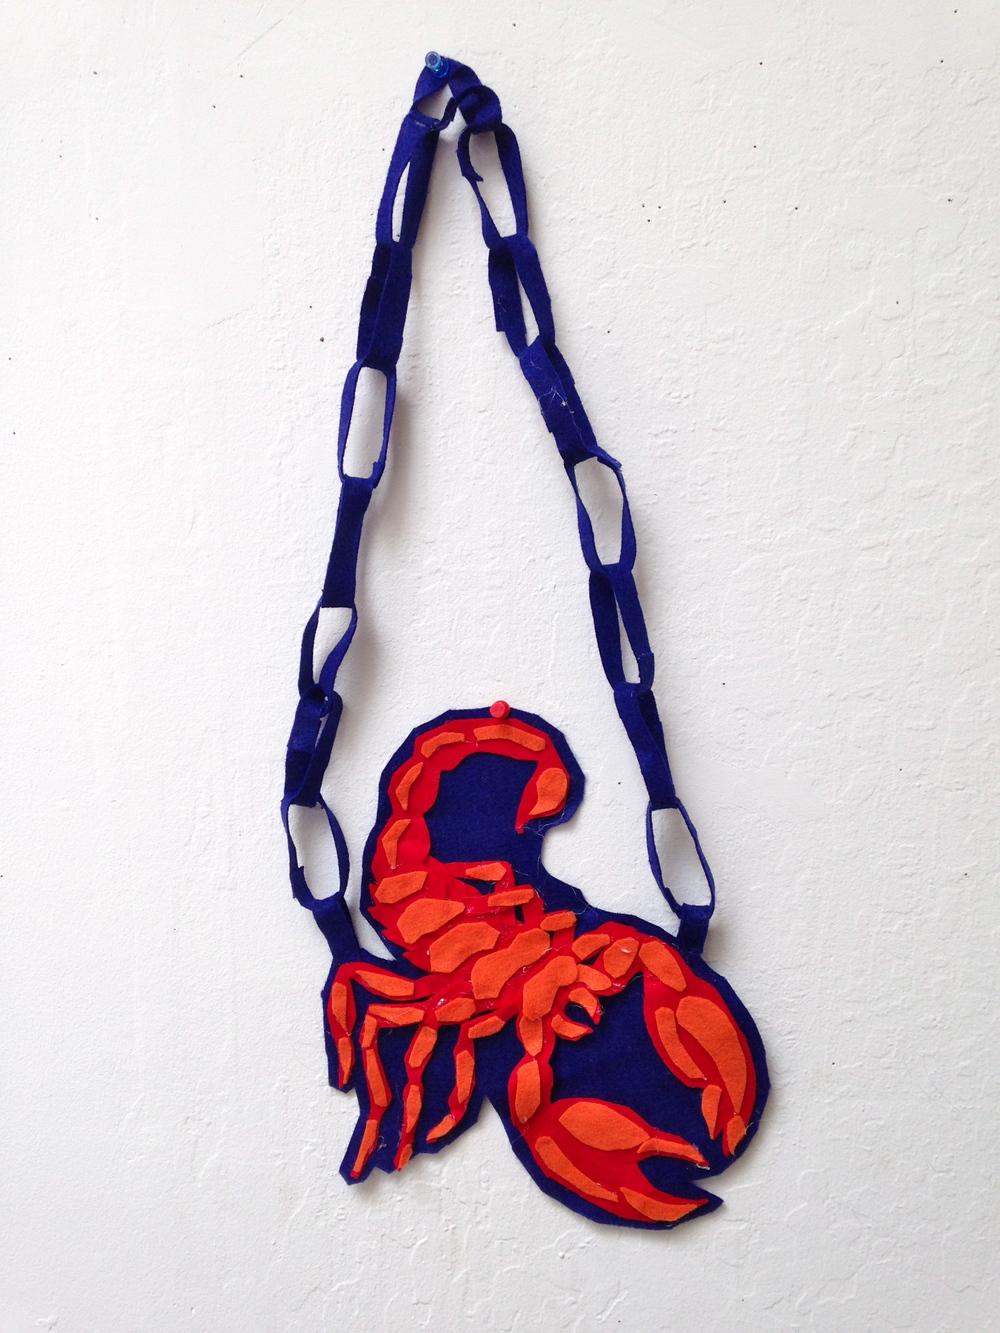 felt scorpion chain